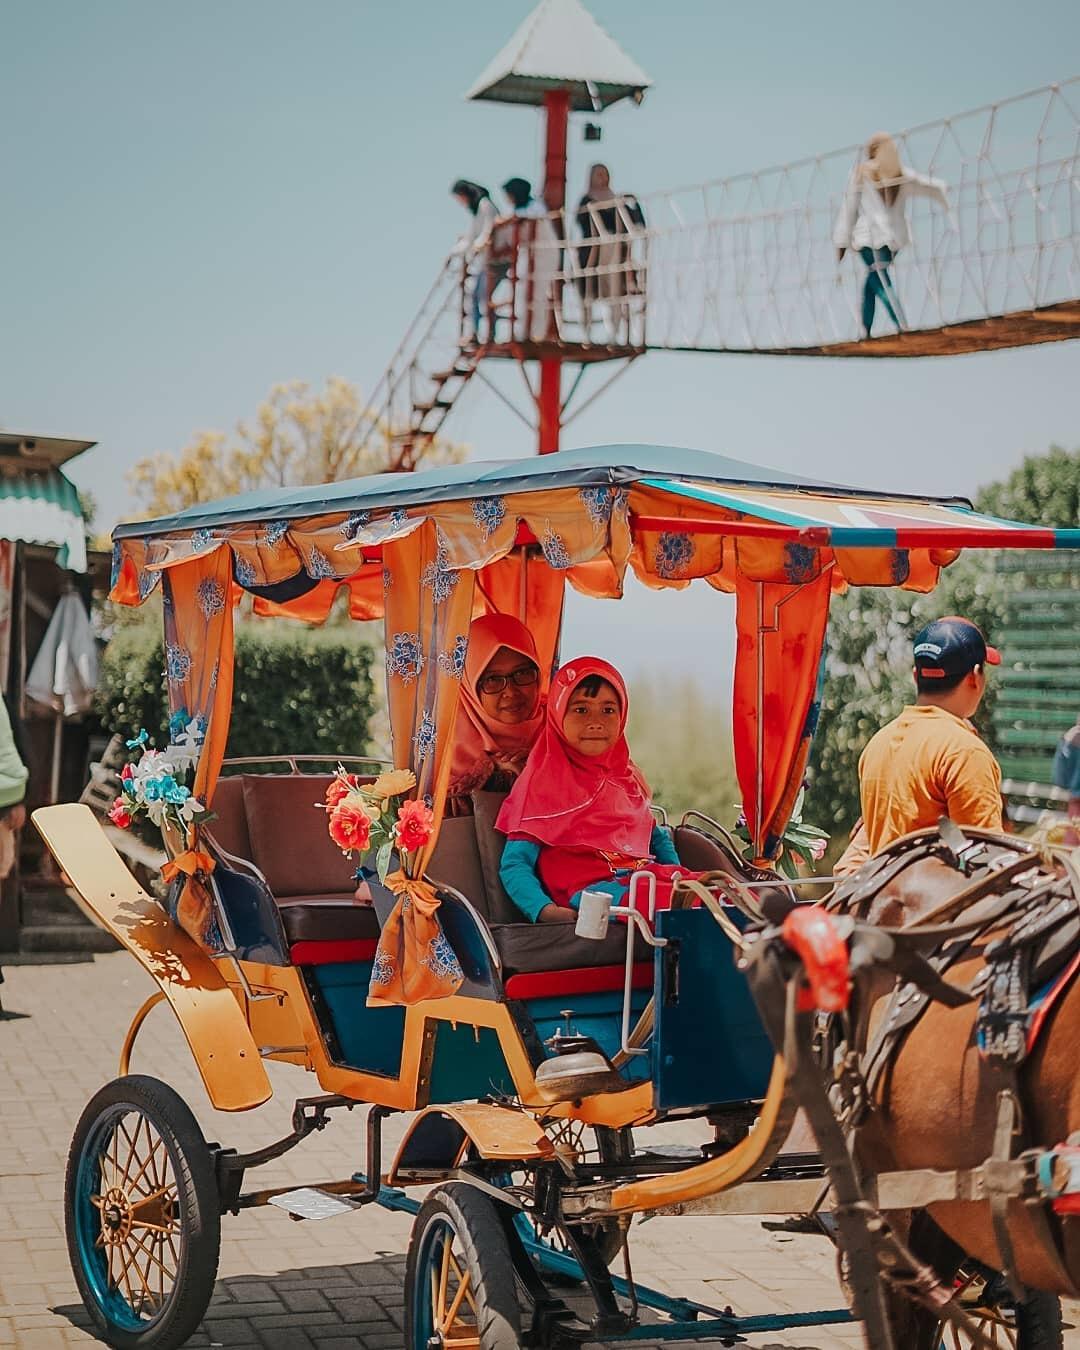 Harga Tiket Masuk Alam Wisata Cimahi Bandung